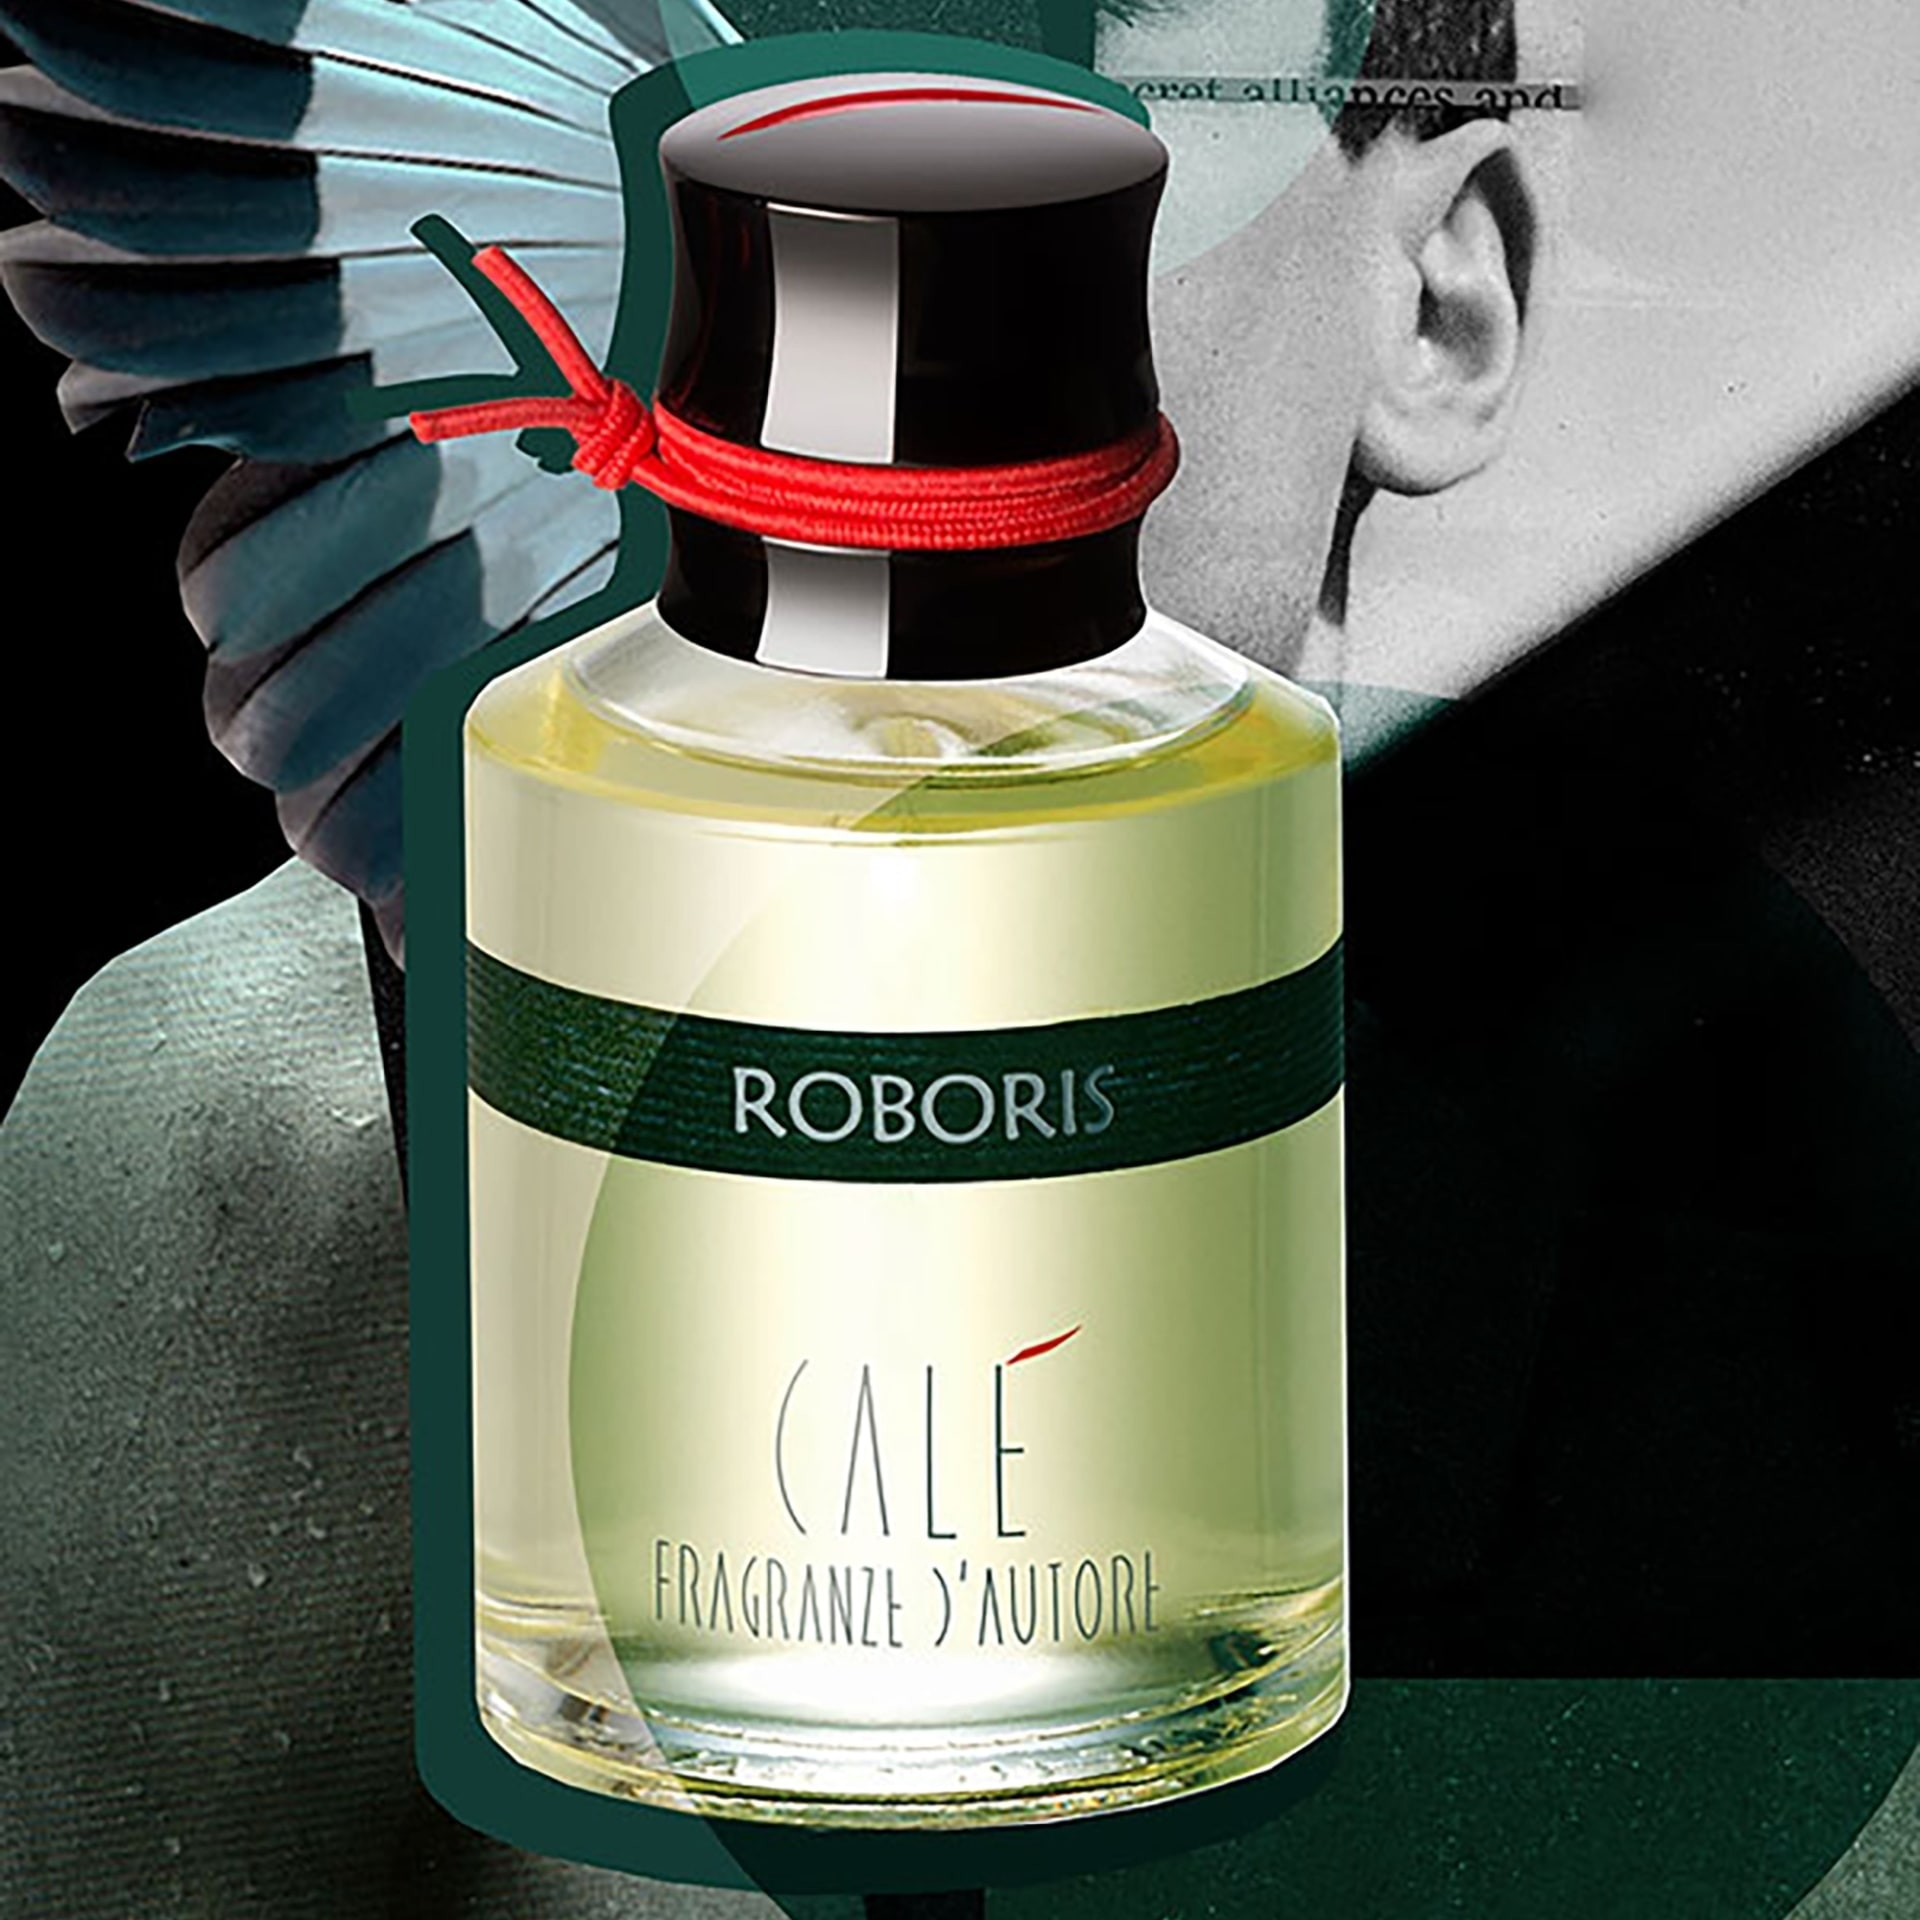 cale-fragranze-dautore-roboris-1